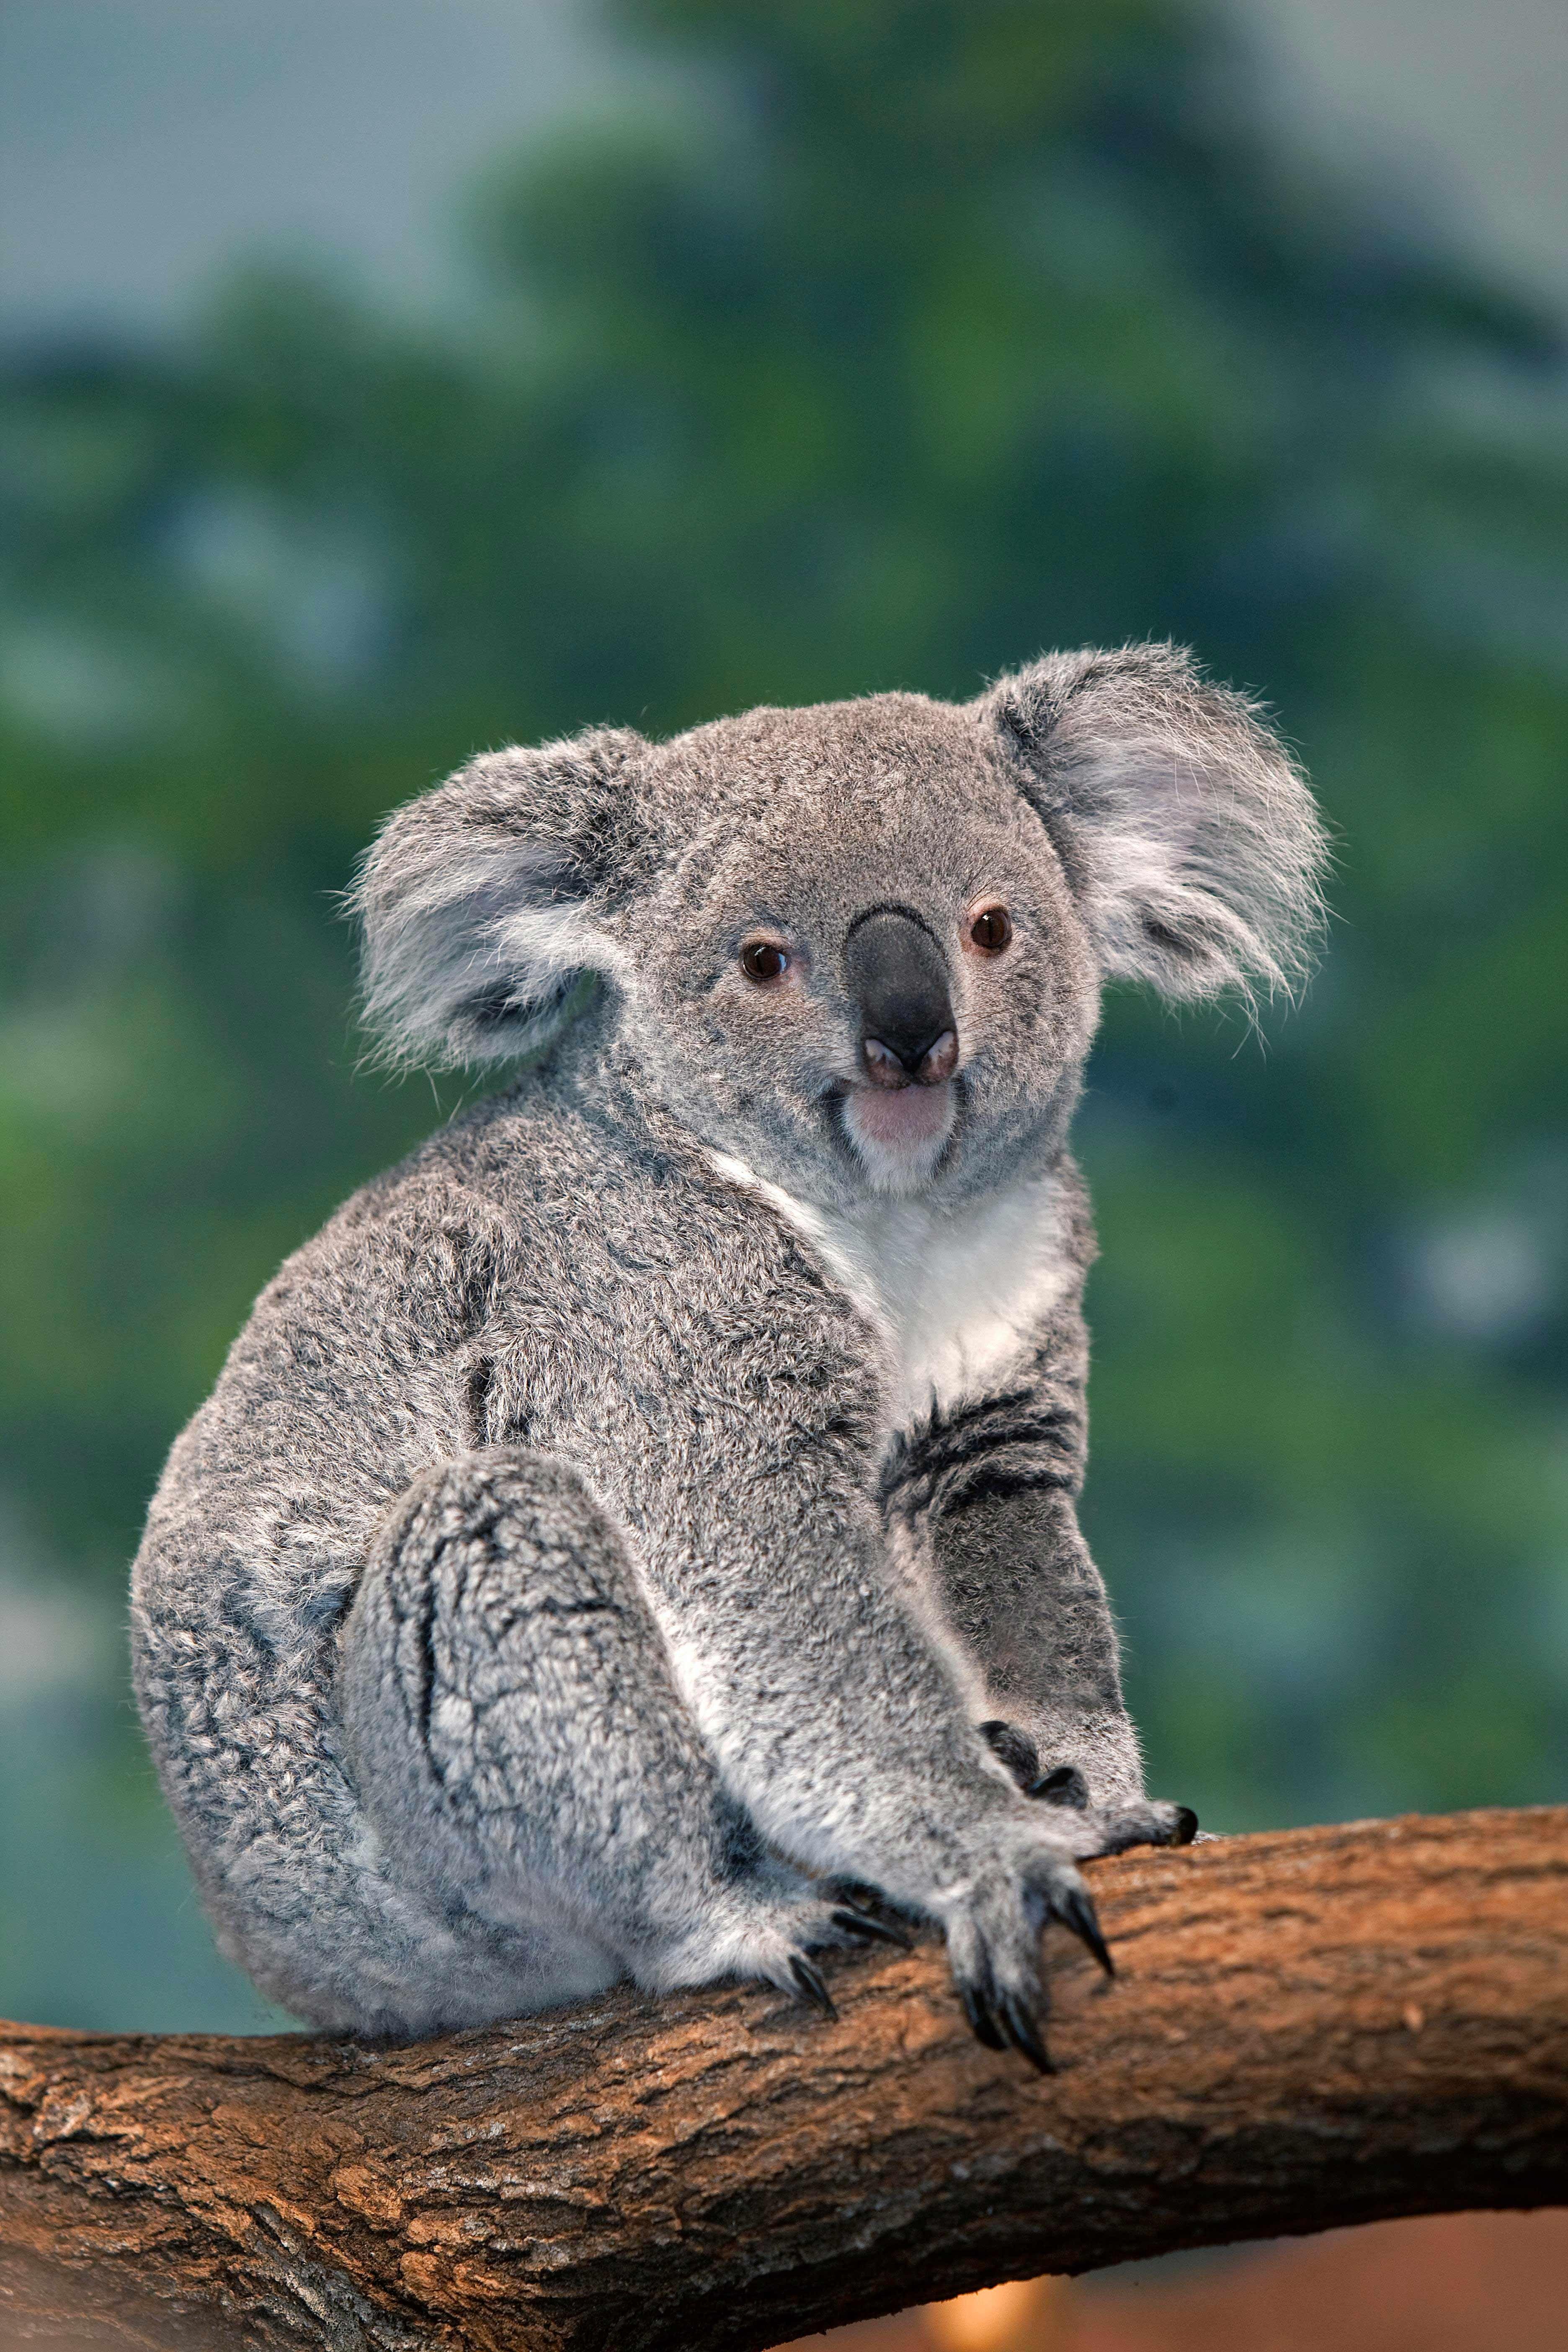 Koala Gerard Lacz Pour Le Zooparc De Beauval Koalas Pinterest